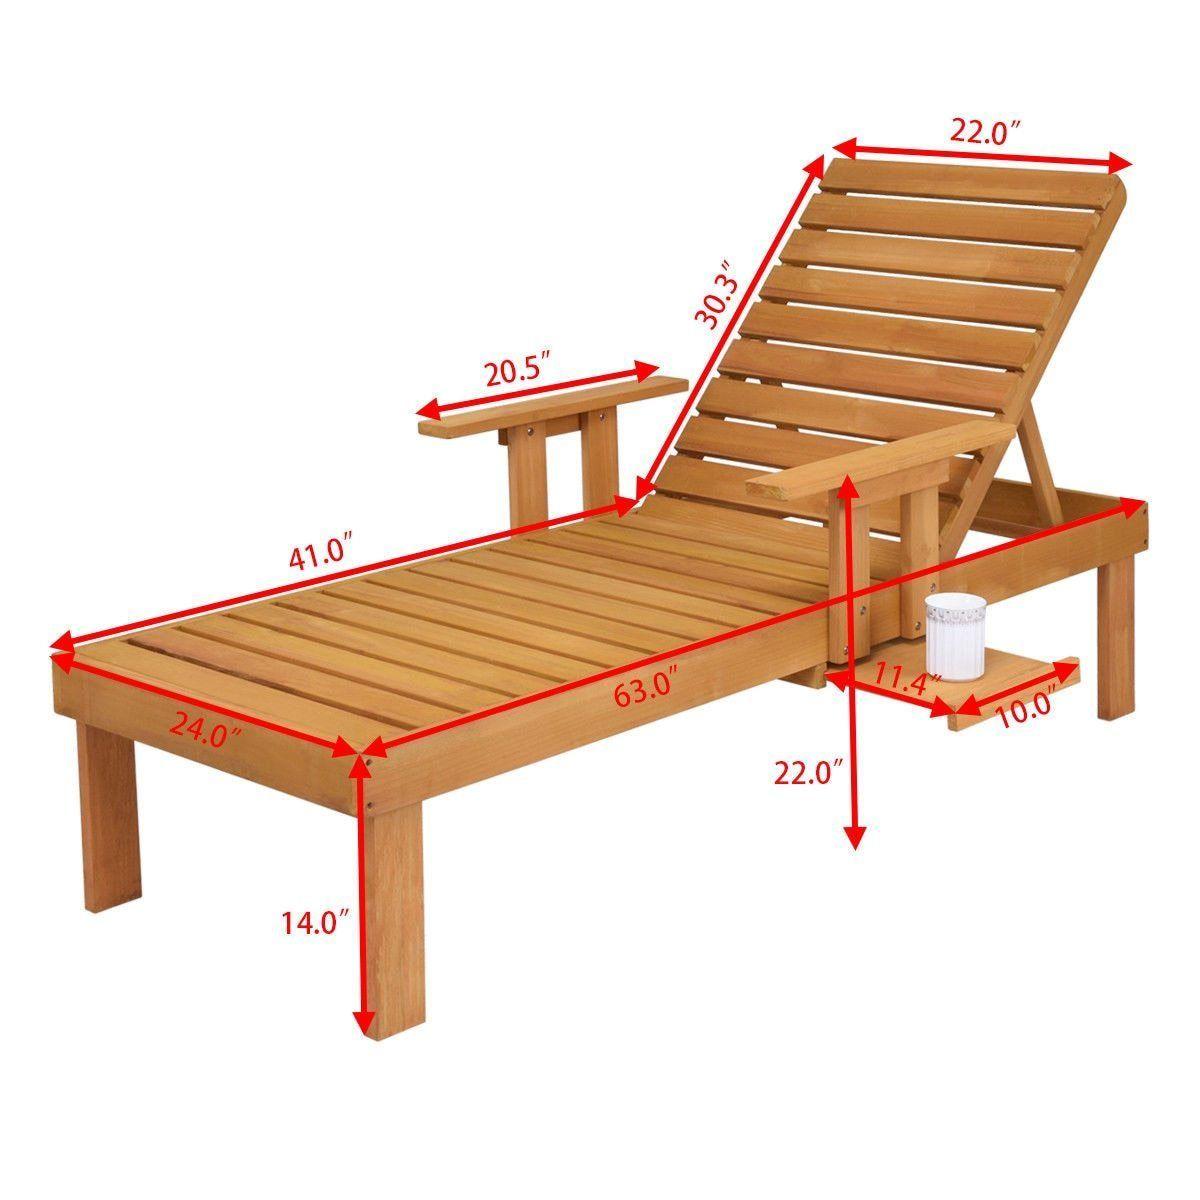 Patio lounger chaise sun outdoor furniture garden side tray deck chair modern wood beach lounge